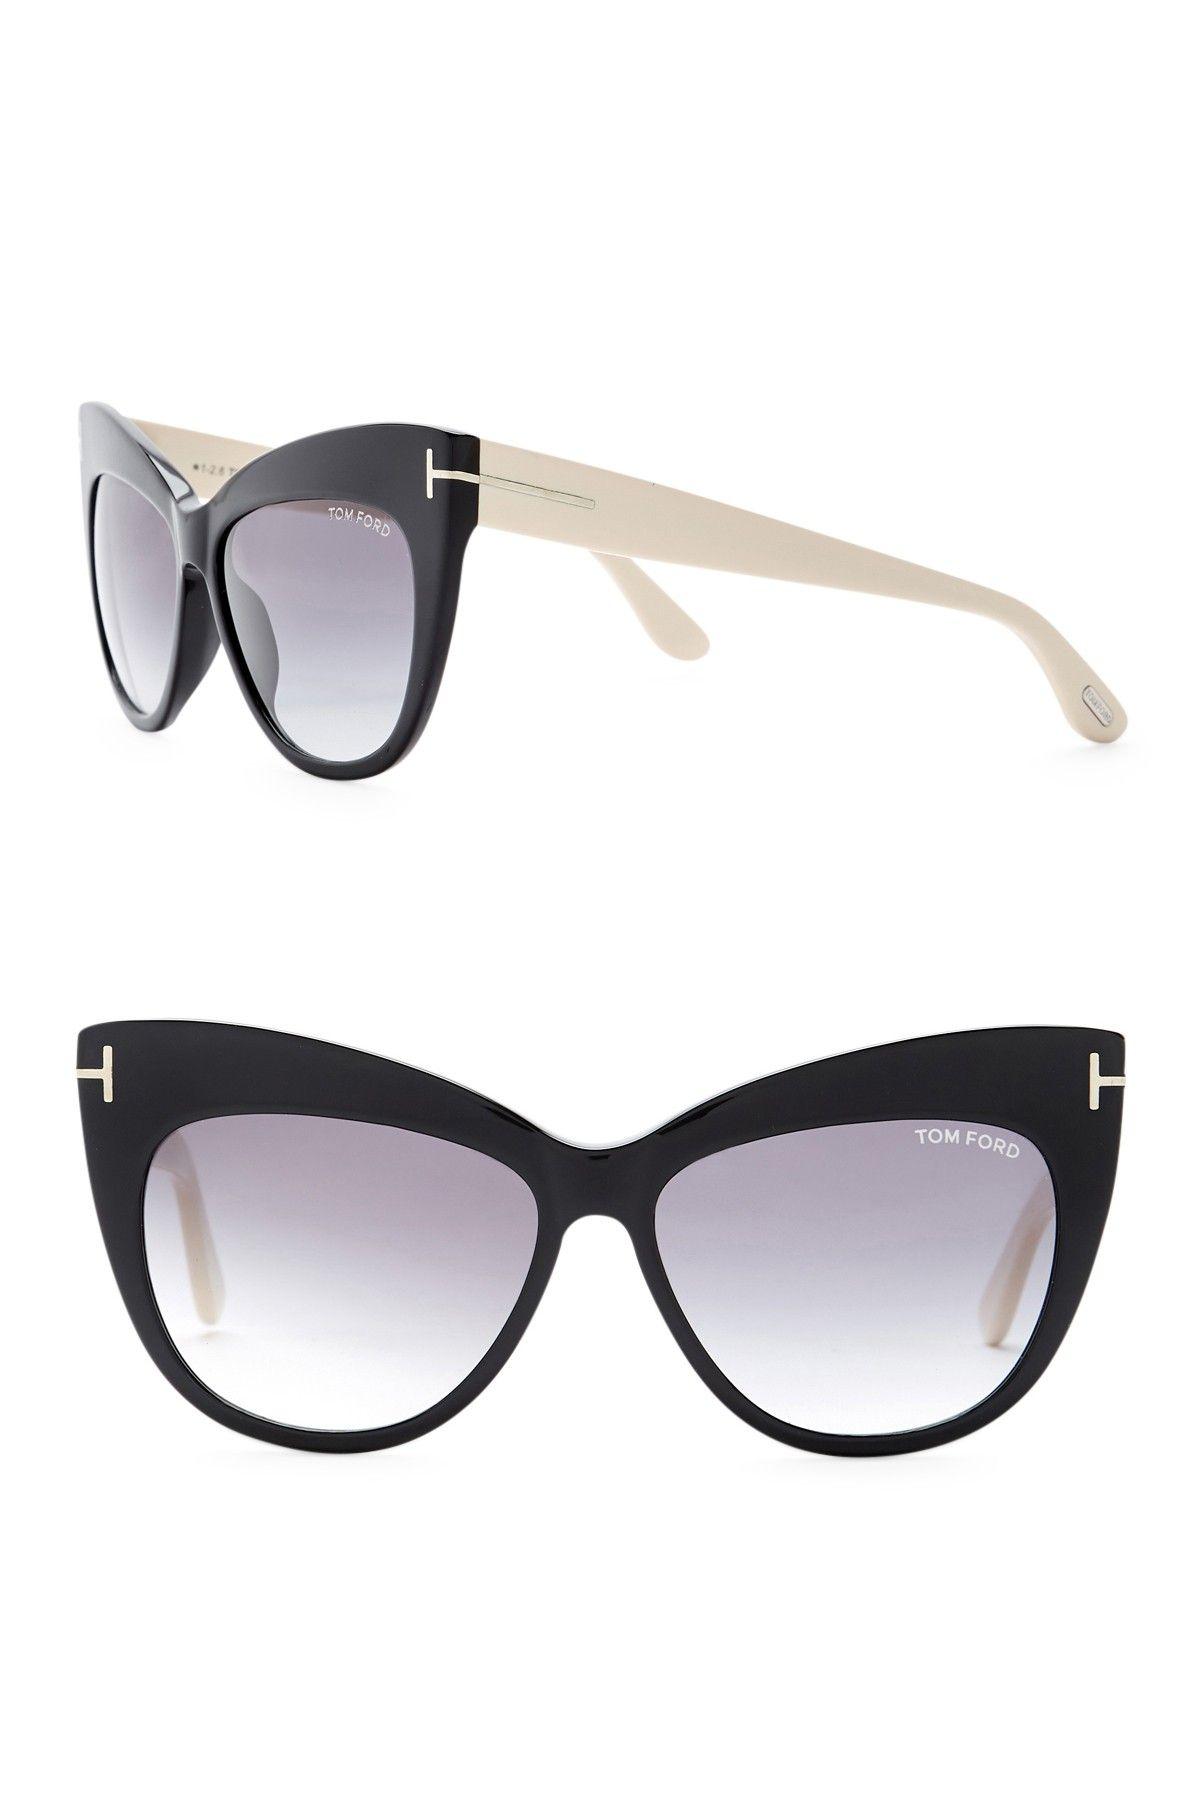 c862fb0ac0d35 Image of Tom Ford Nika 56mm Gradient Cat Eye Sunglasses